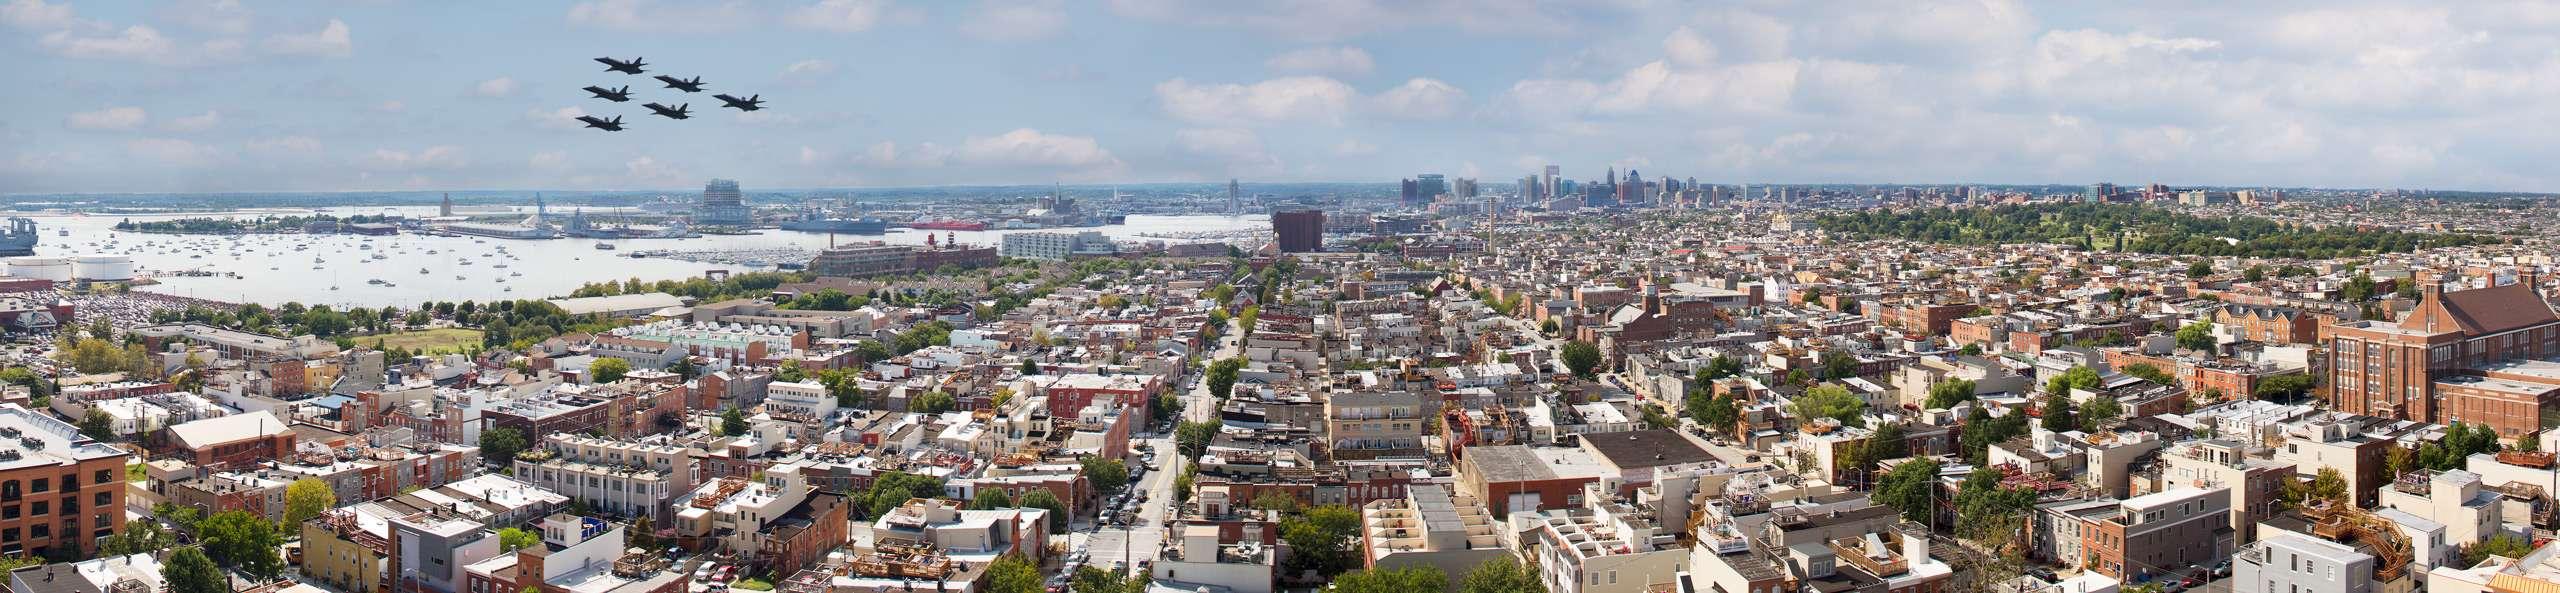 PORTFOLIO - Baltimore - Attractions   #21